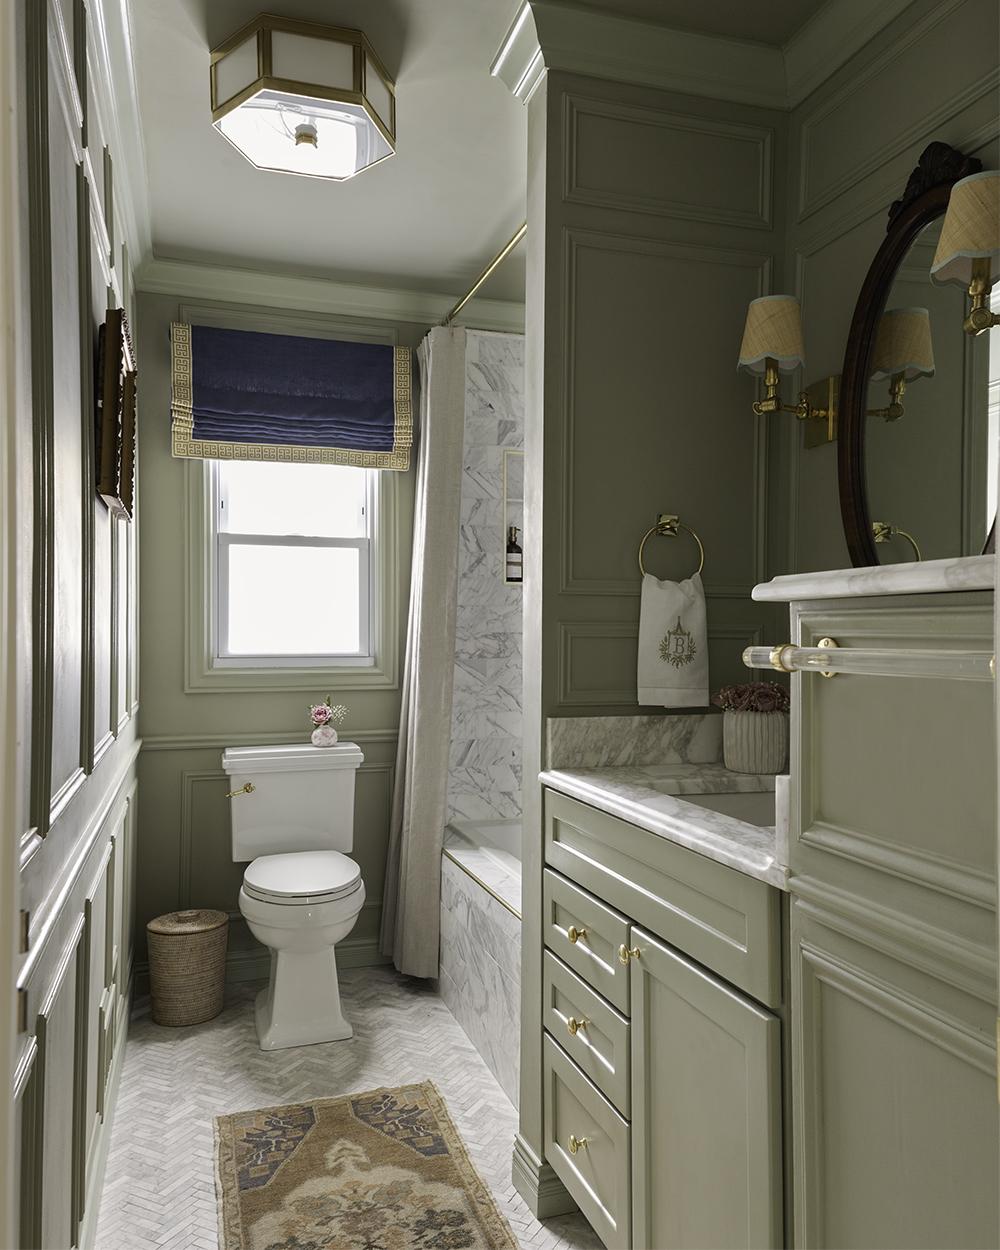 bathroom-reveal-in-phtooshop-1